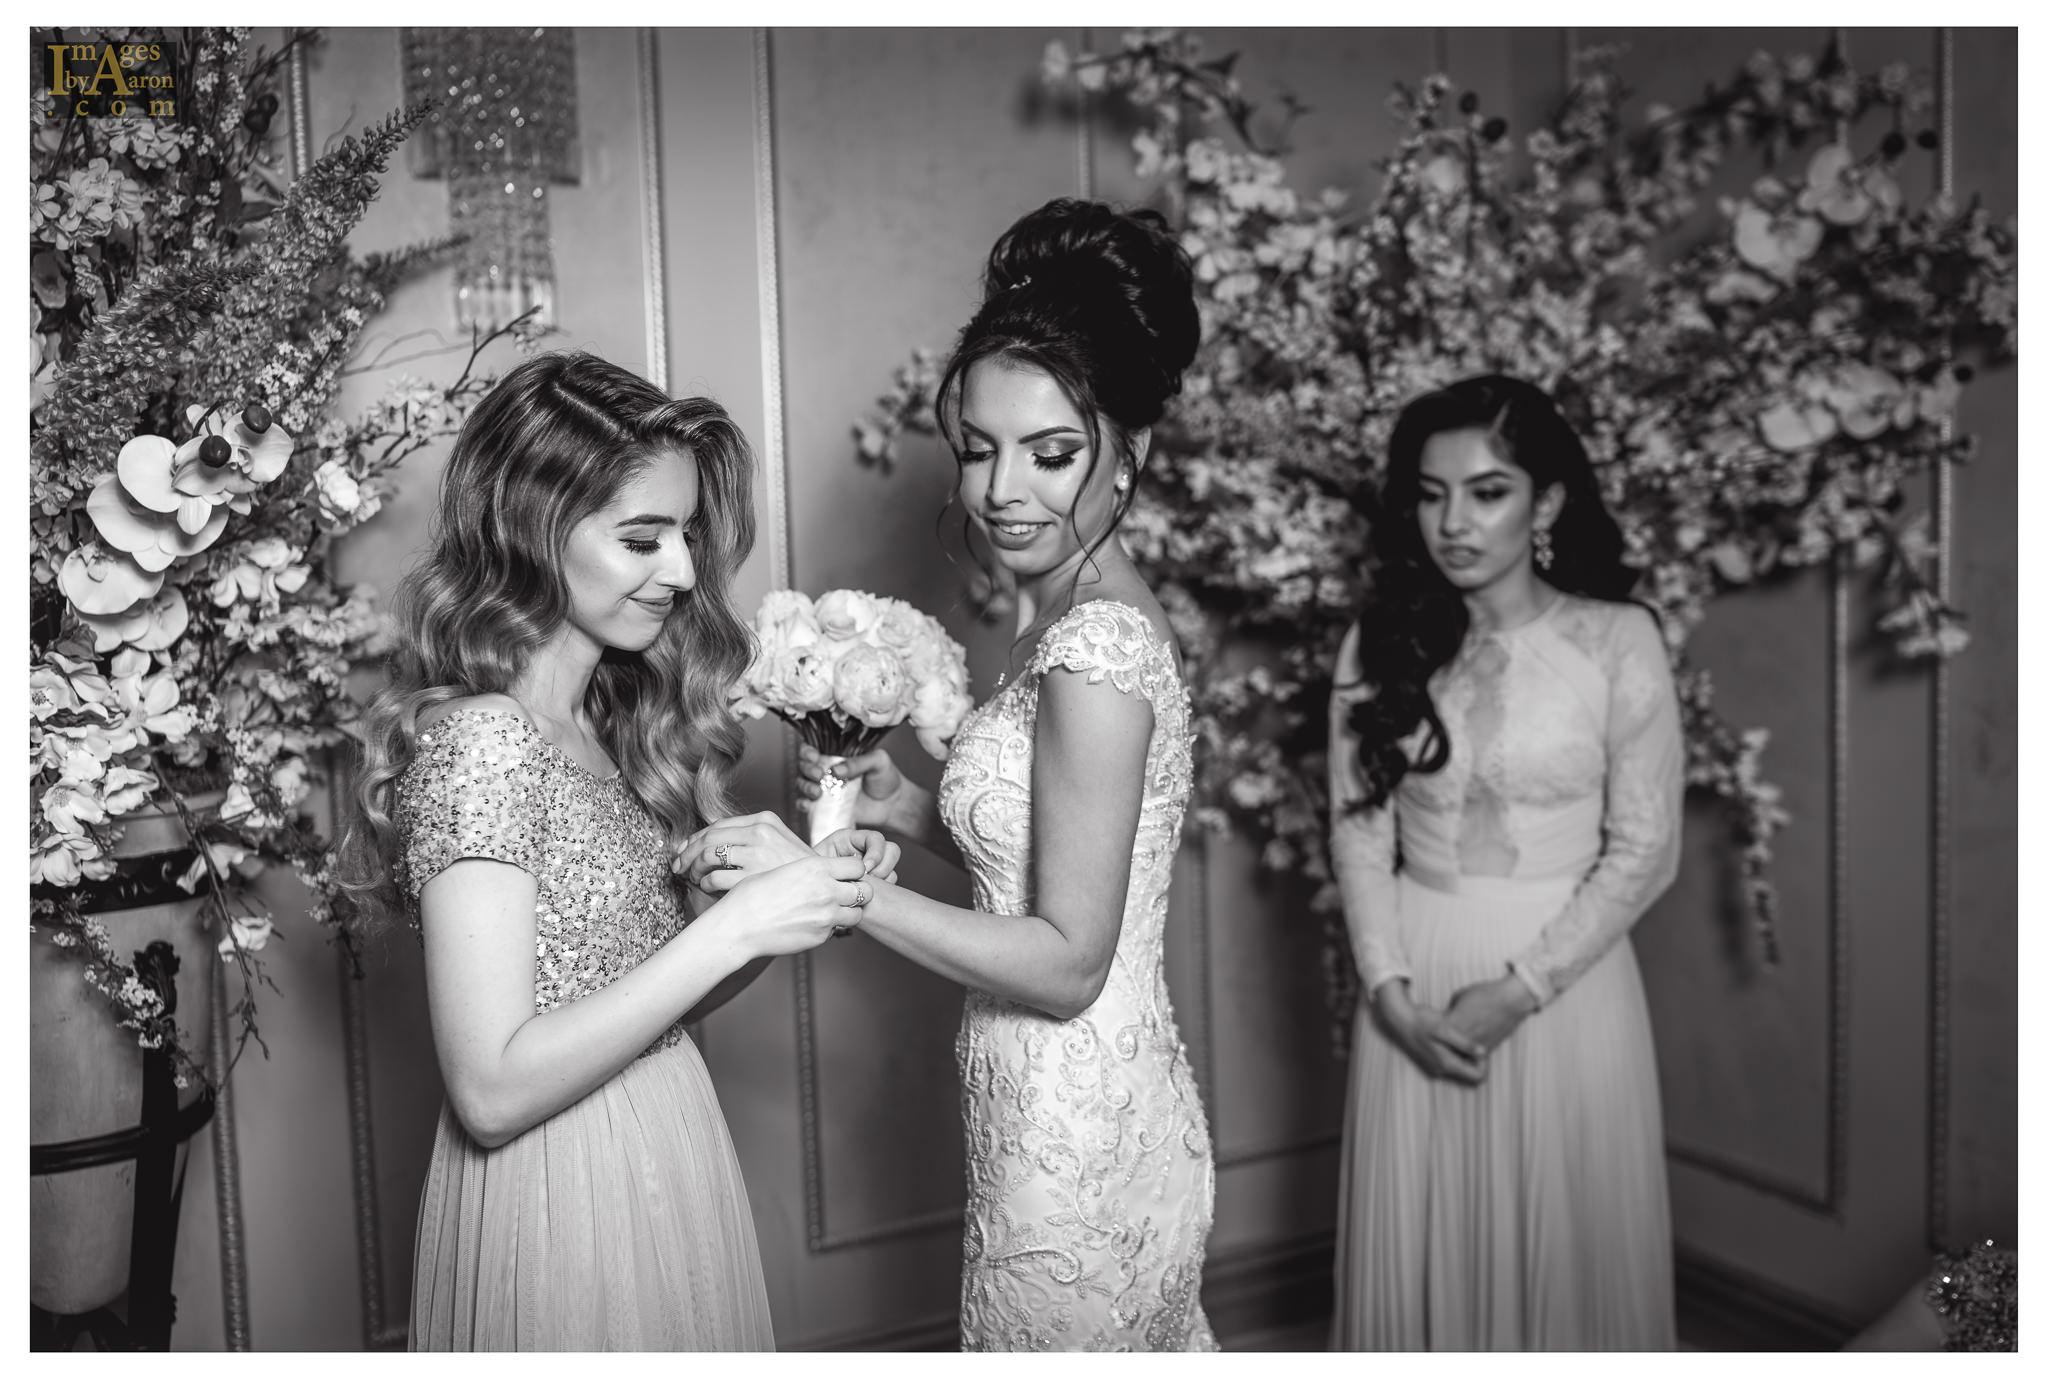 Gokce Turkish Wedding Gtting Ready New York Photographer Wedding Photography The Royal Manor-1-3.jpg